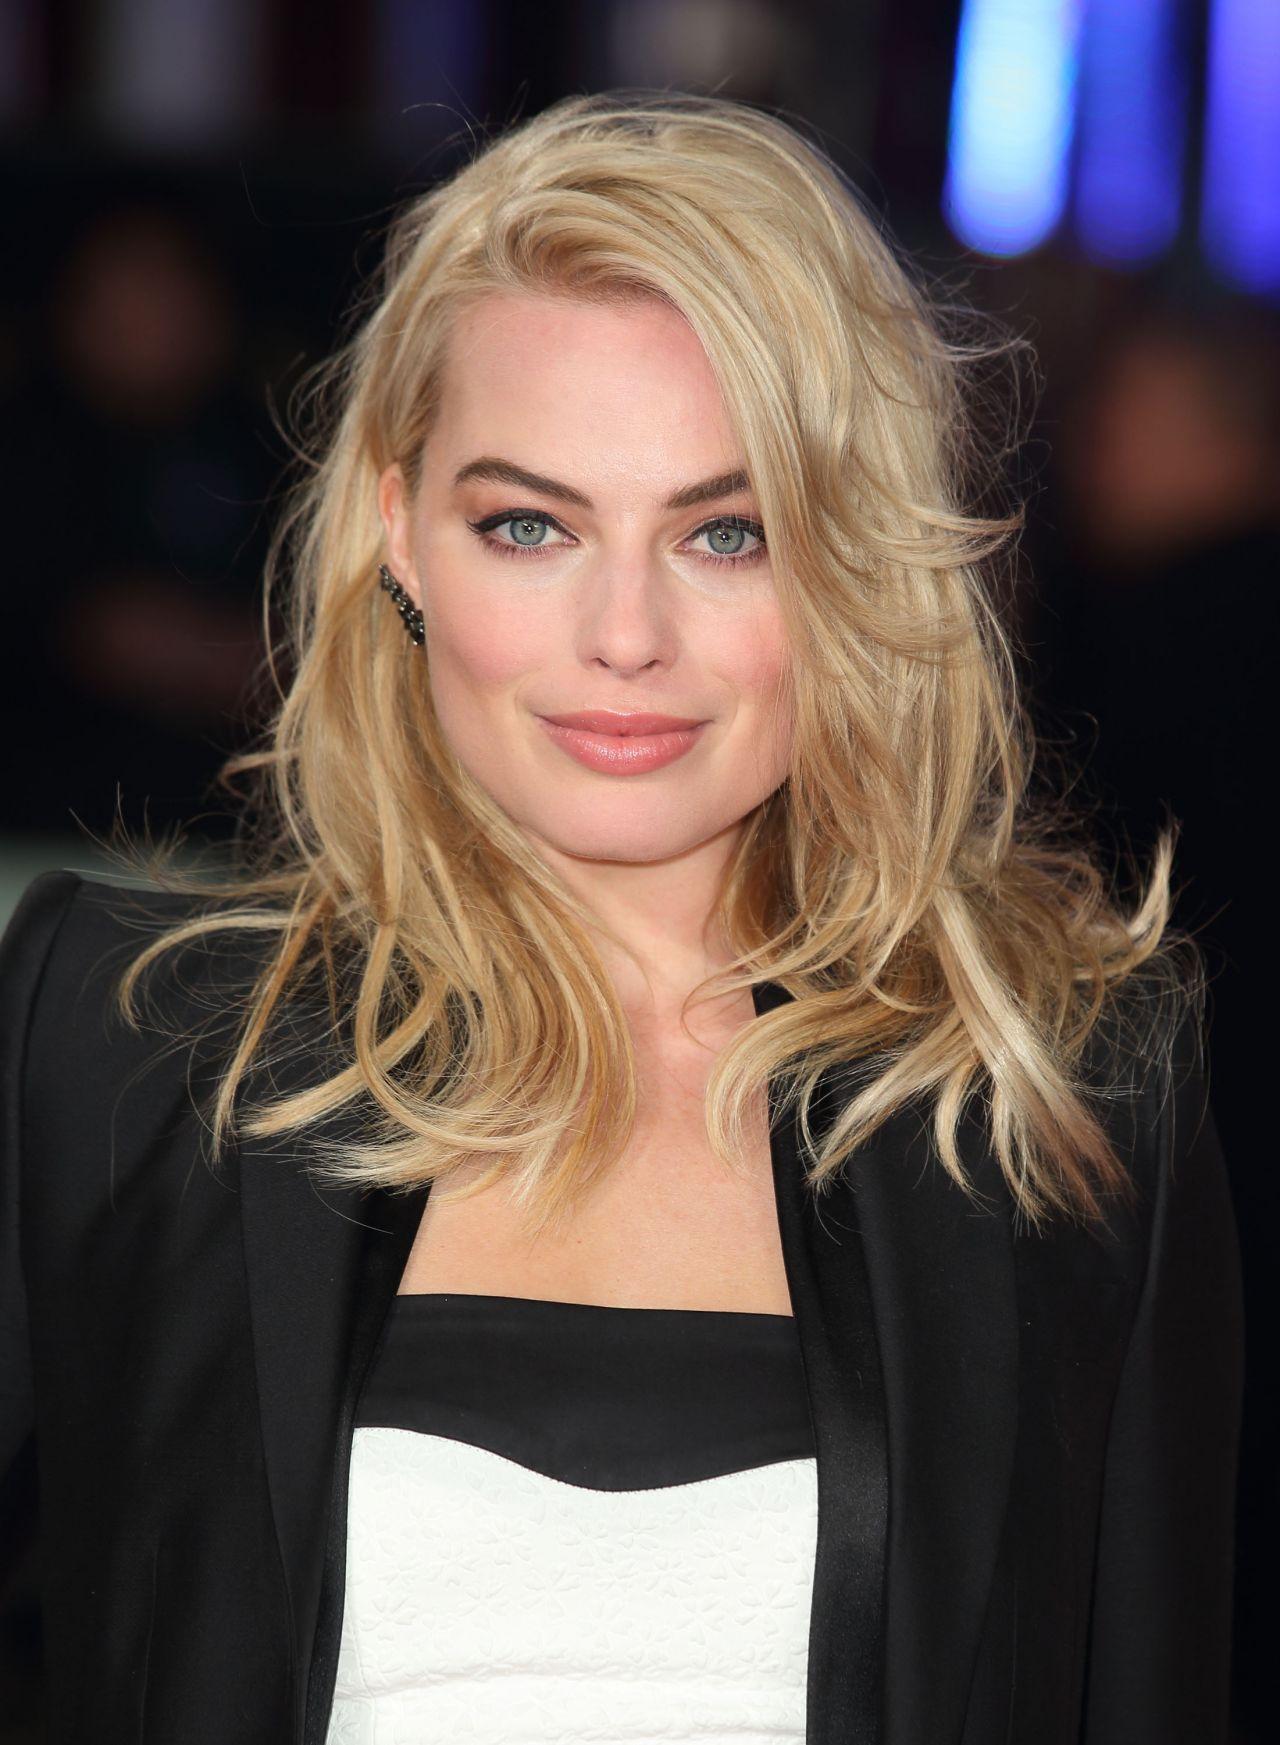 Margot Robbie On Red Carpet Focus Screening In London